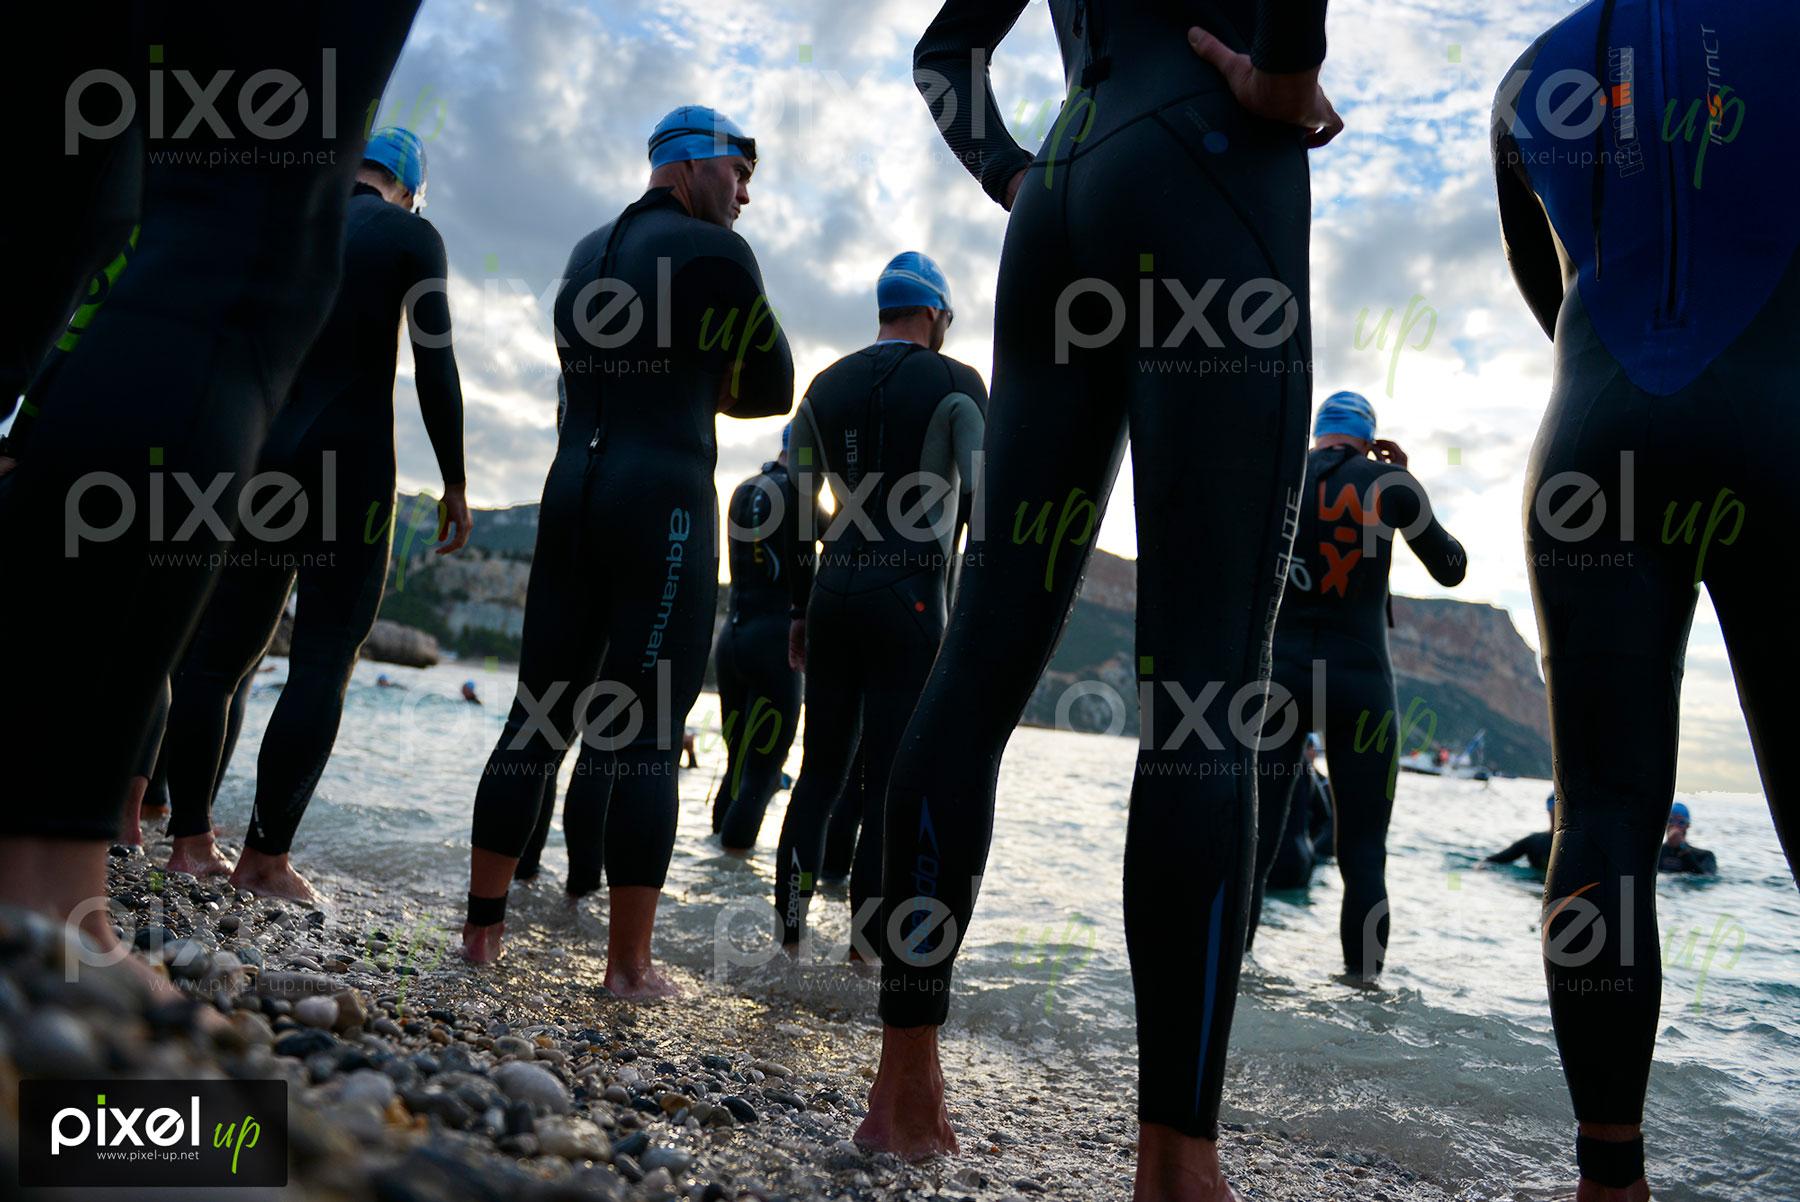 Photographe Pixel up - Reportage sportif